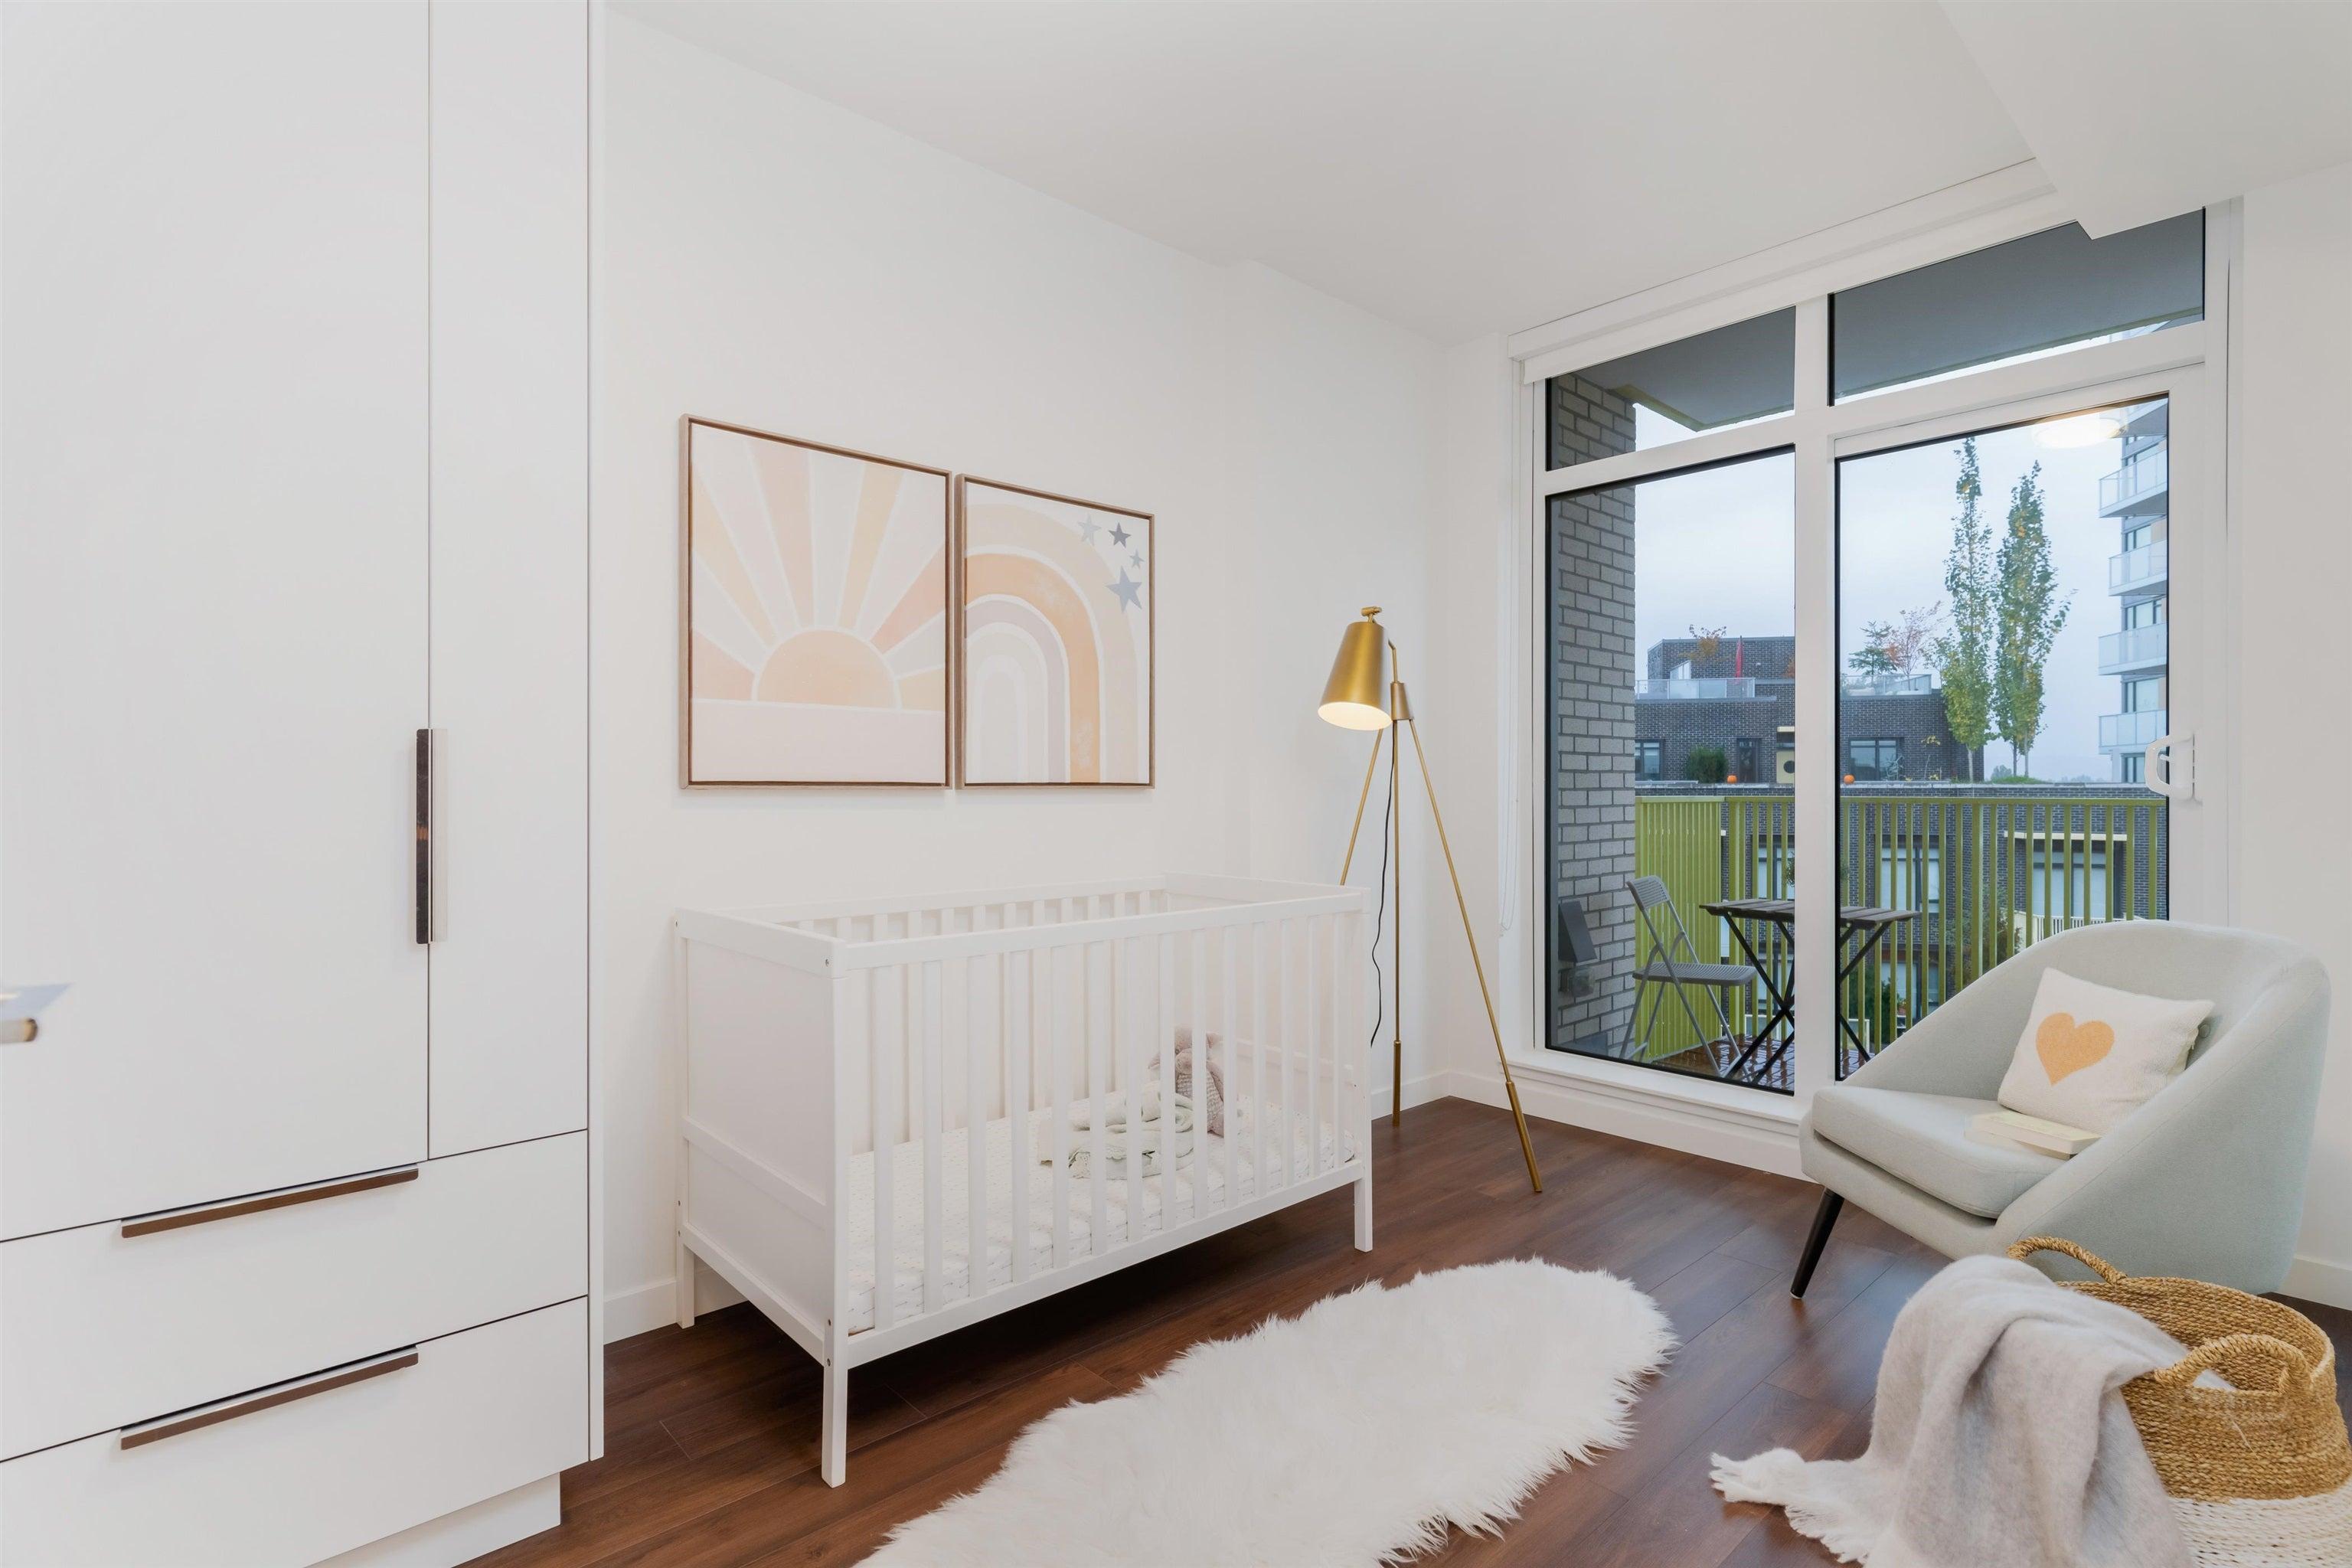 523 2508 WATSON STREET - Mount Pleasant VE Townhouse for sale, 3 Bedrooms (R2625701) - #20